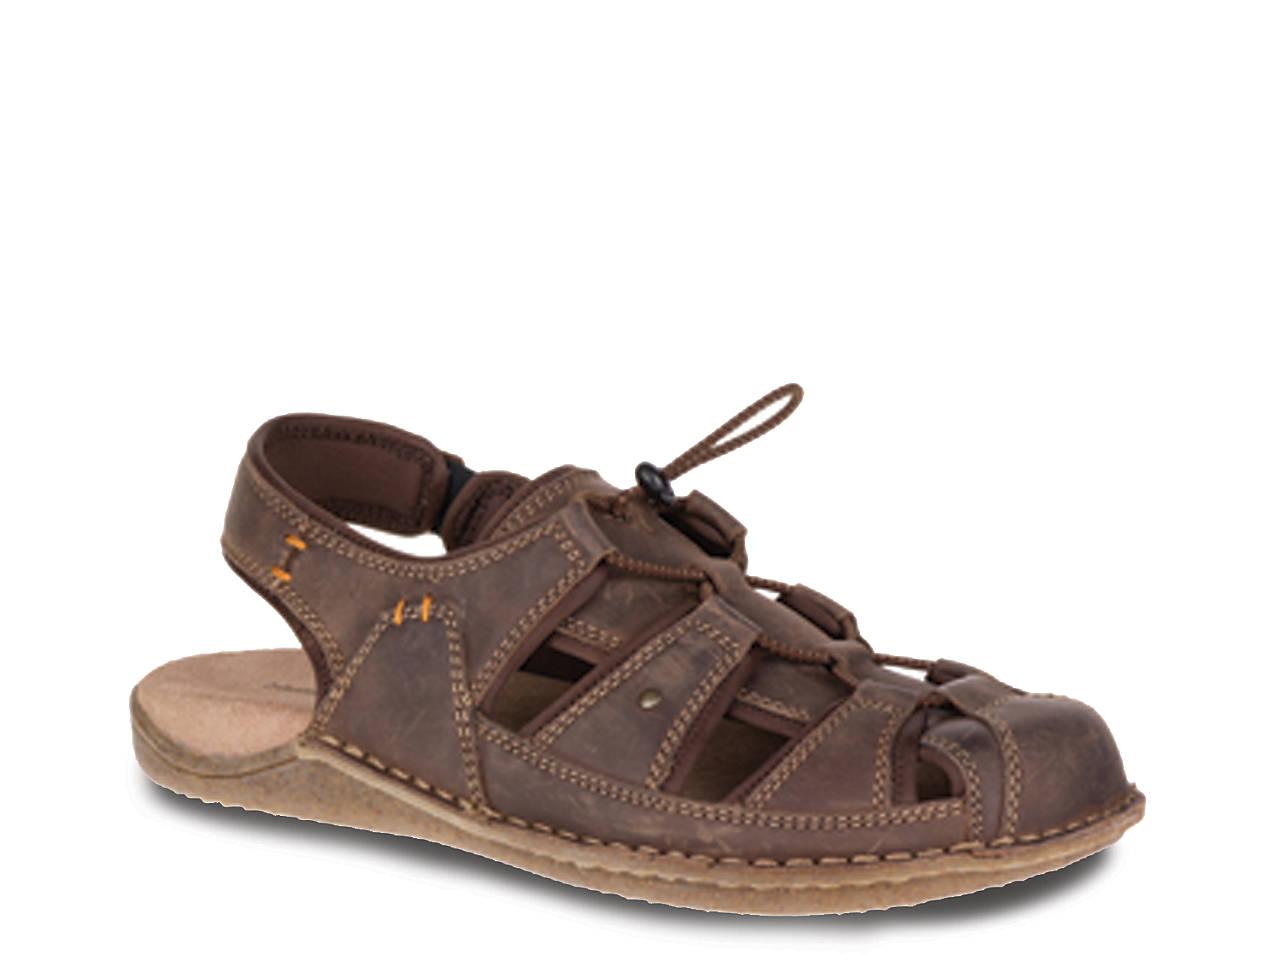 658084bc79898 Hush Puppies Bergen Grady Fisherman Sandal Men's Shoes | DSW